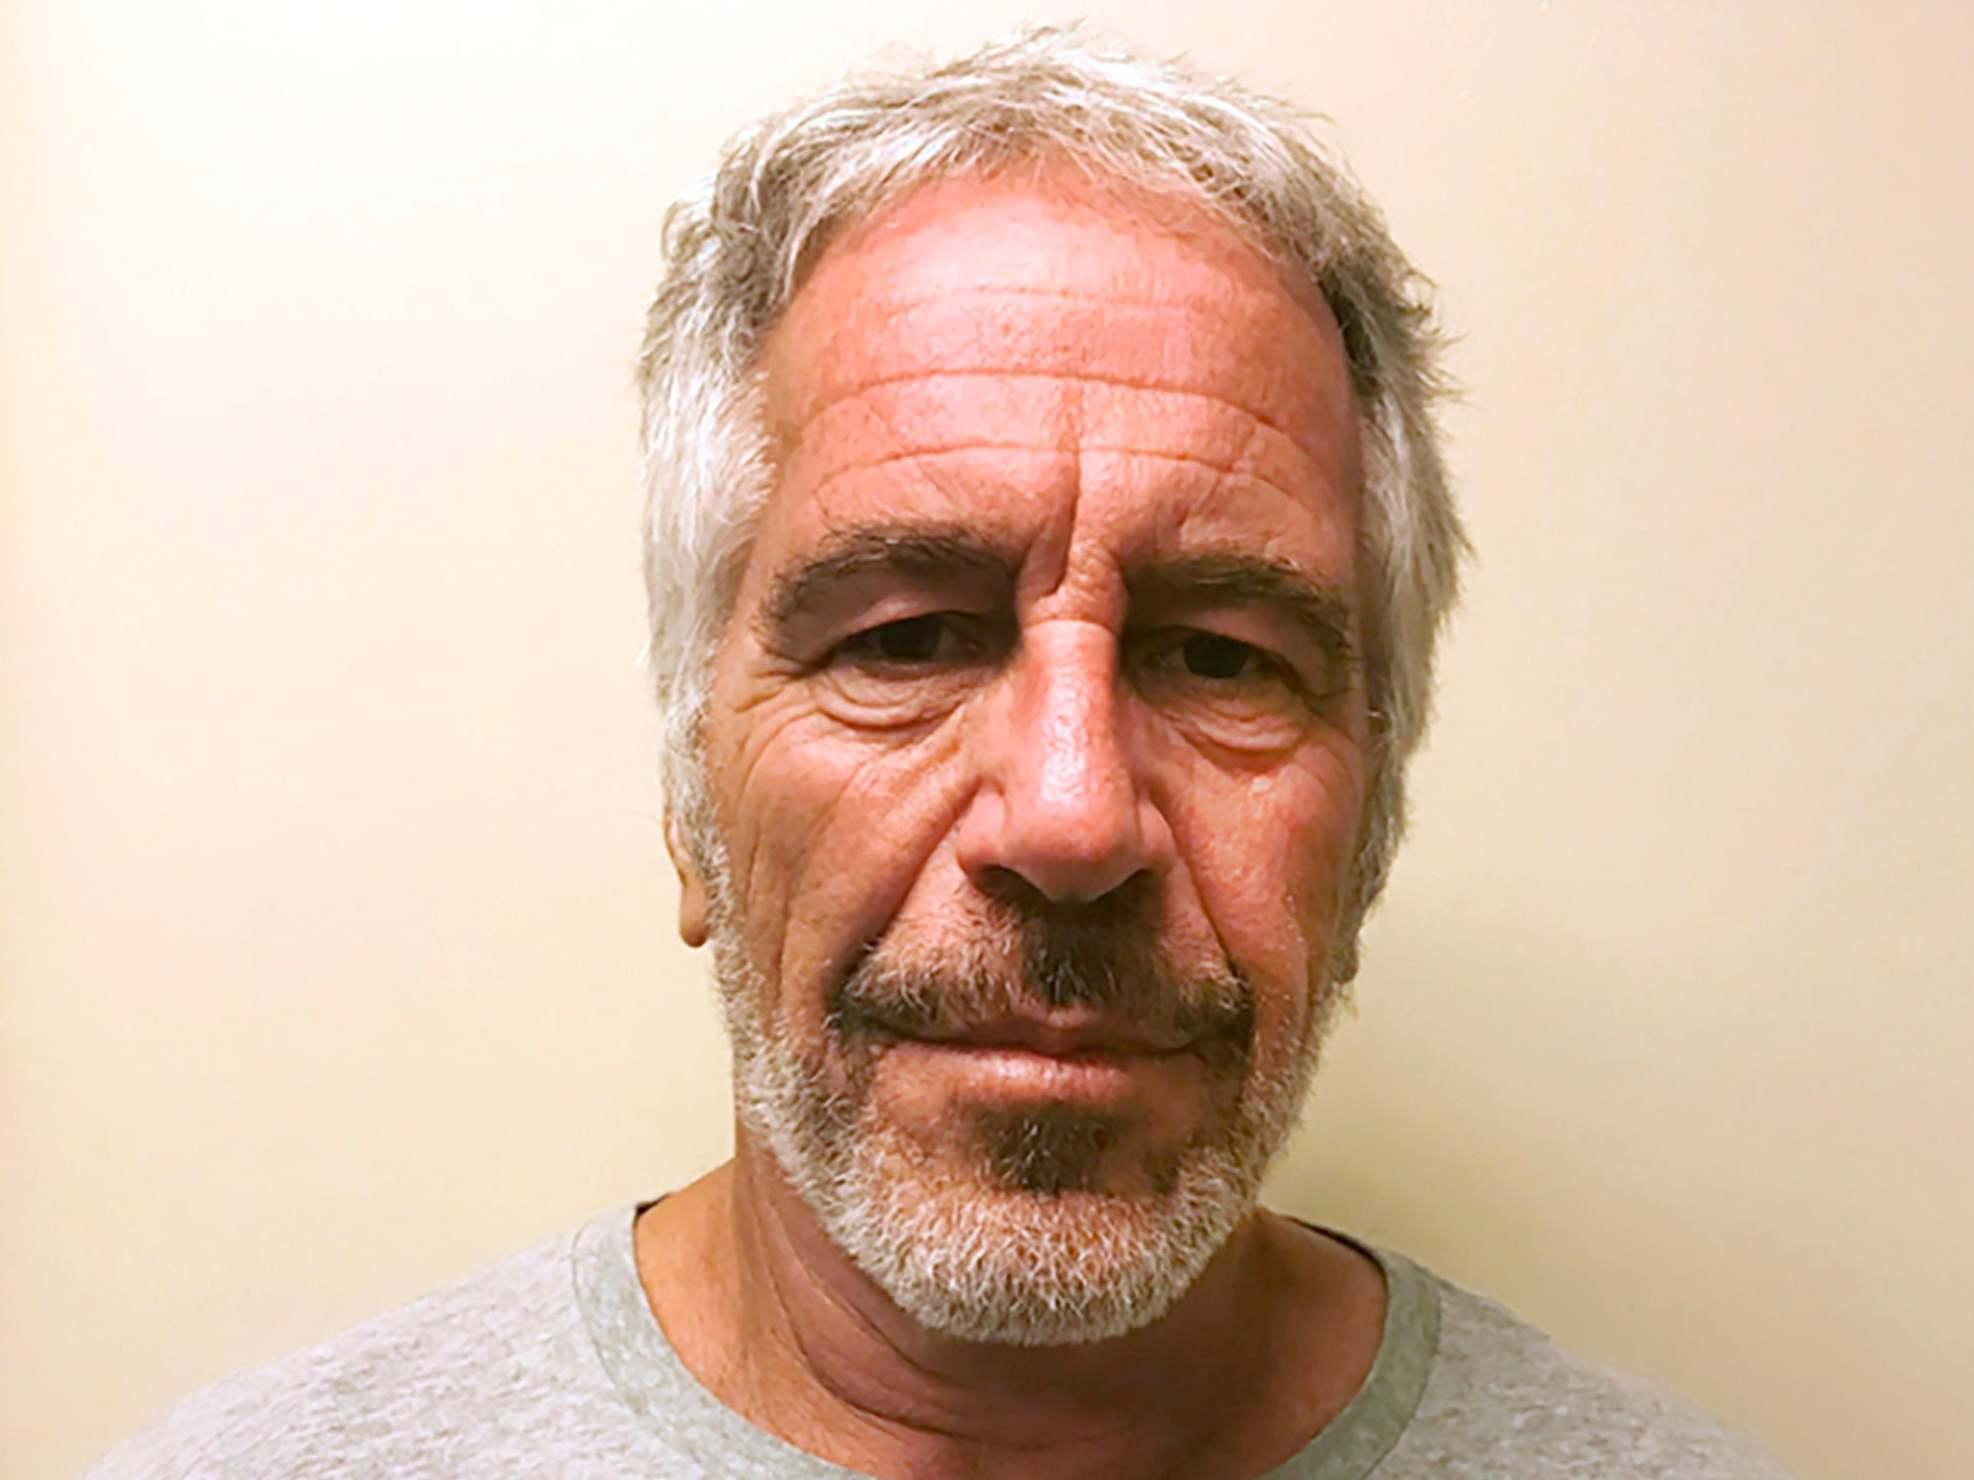 Jeffrey Epstein: Sealed court documents contain 'hundreds of